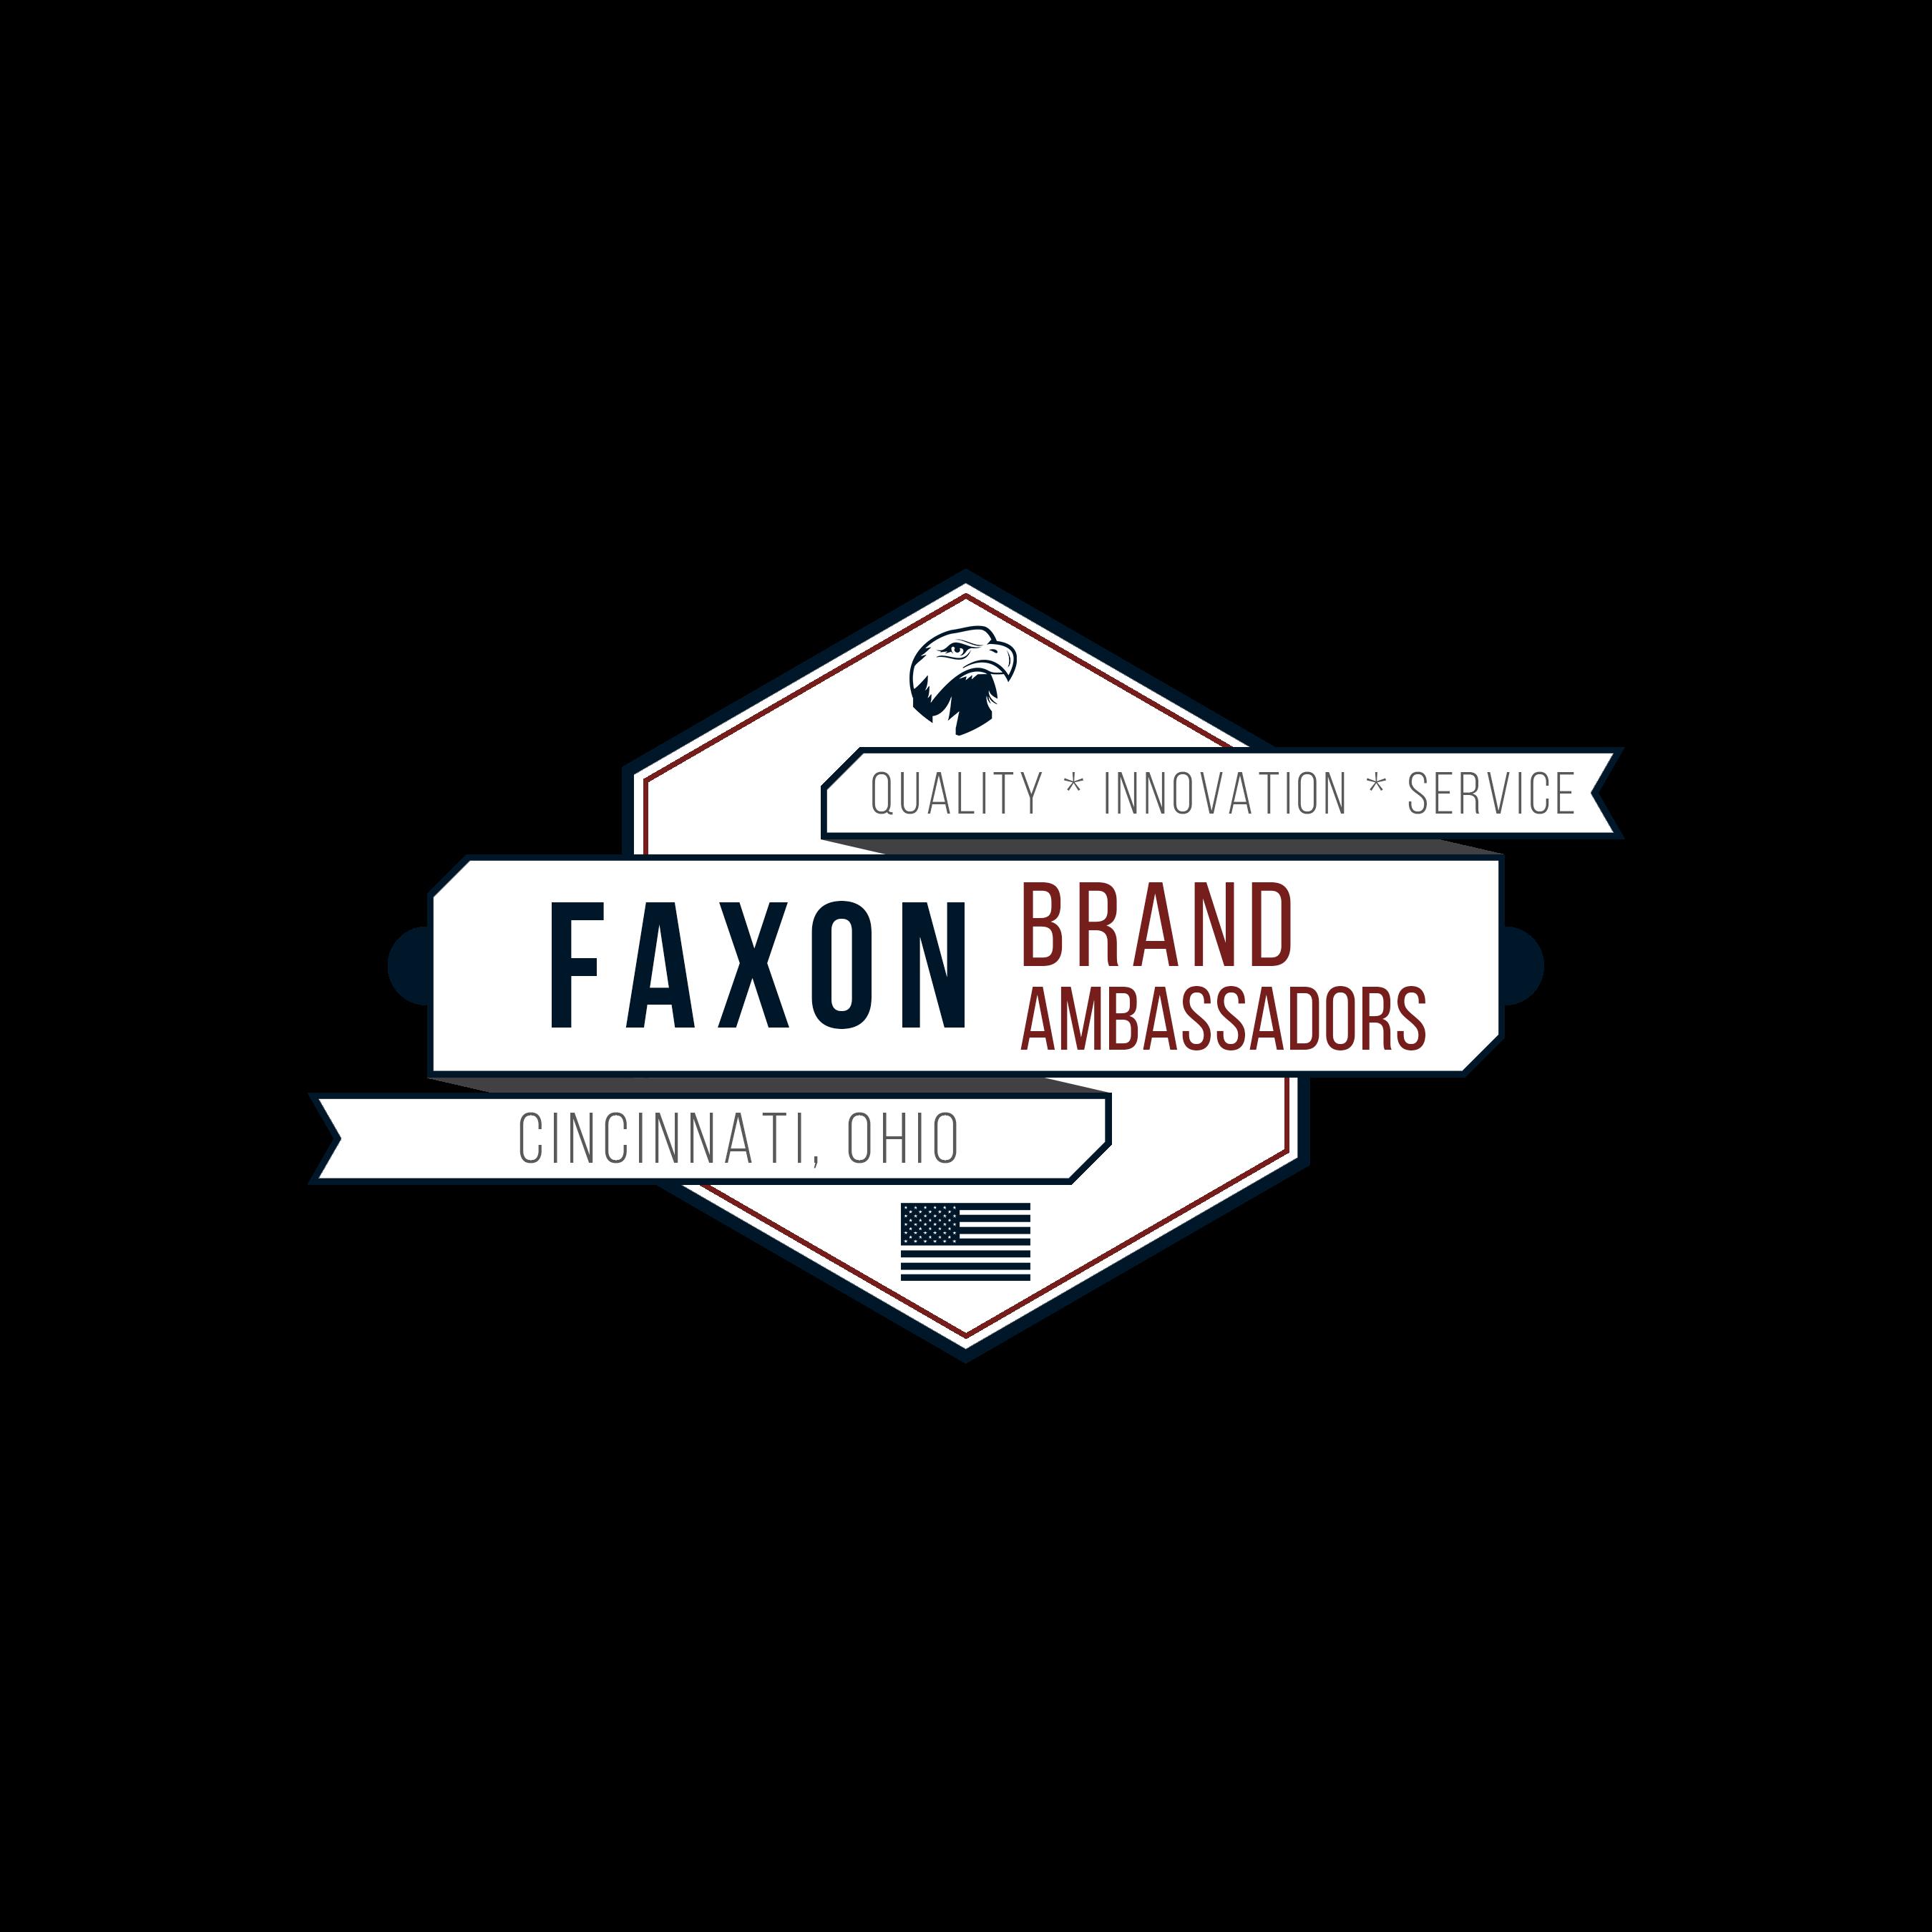 faxon-brand-ambassador-logo.png